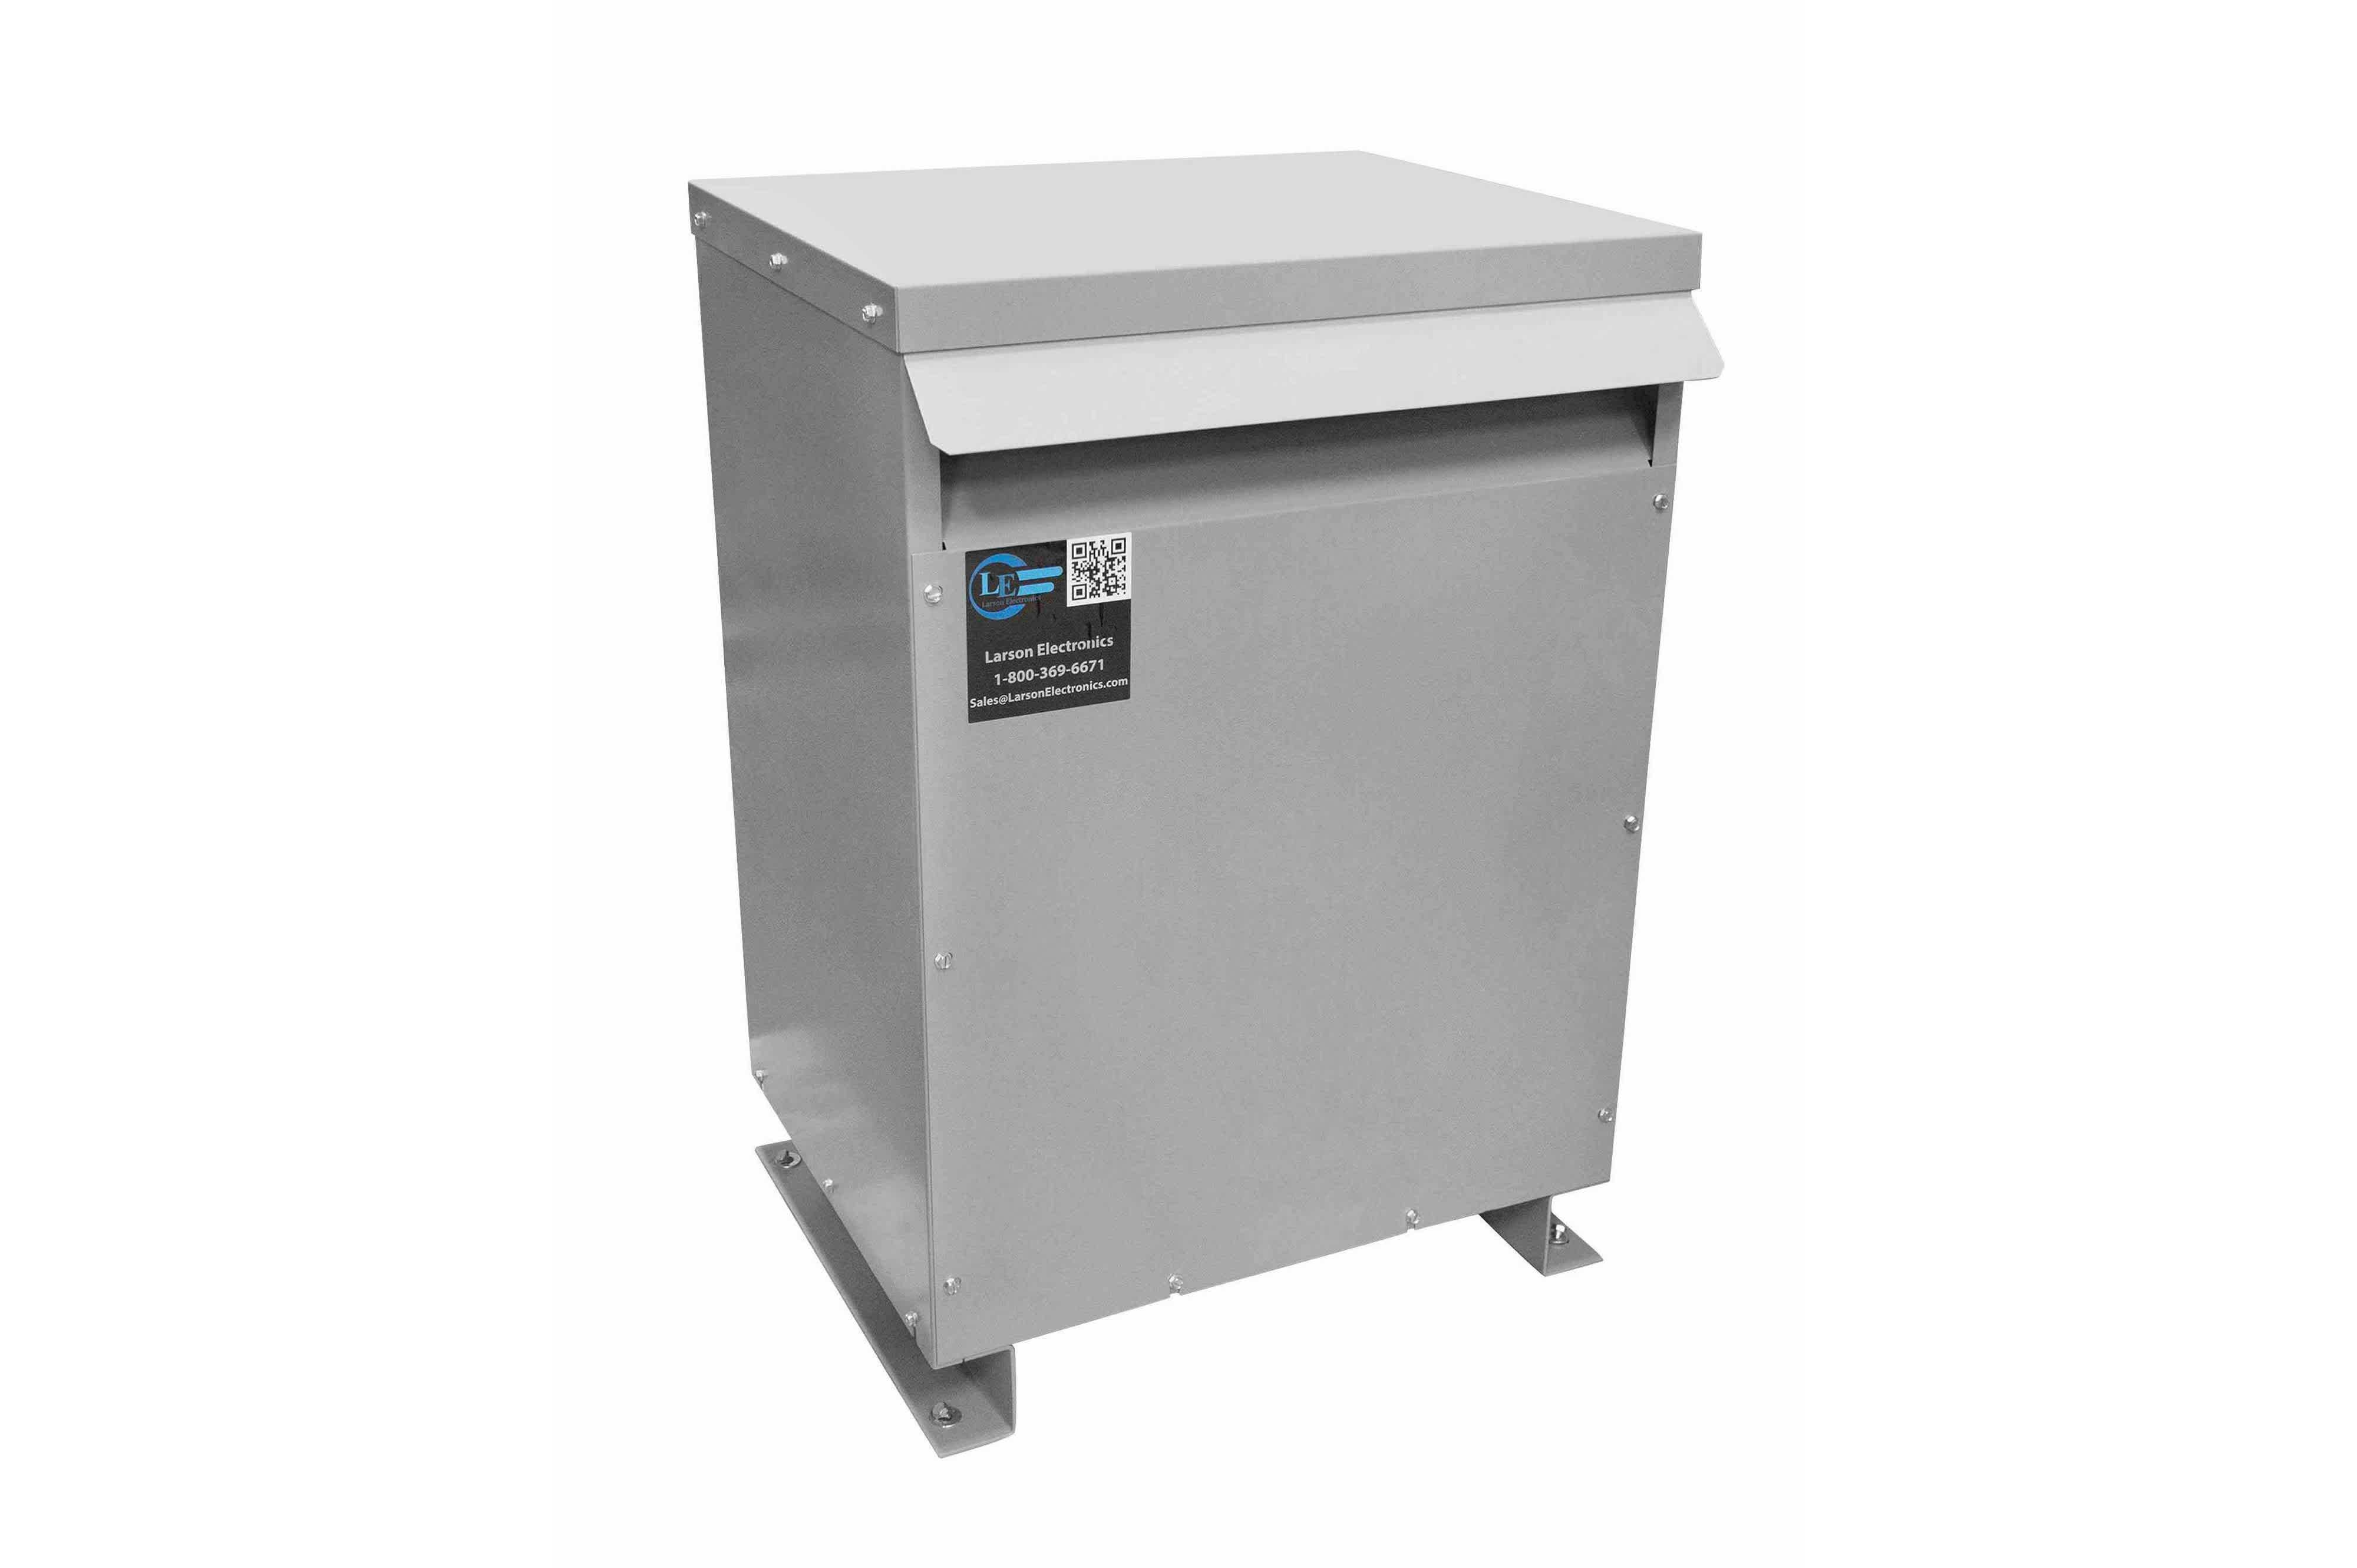 26 kVA 3PH Isolation Transformer, 415V Wye Primary, 240V Delta Secondary, N3R, Ventilated, 60 Hz